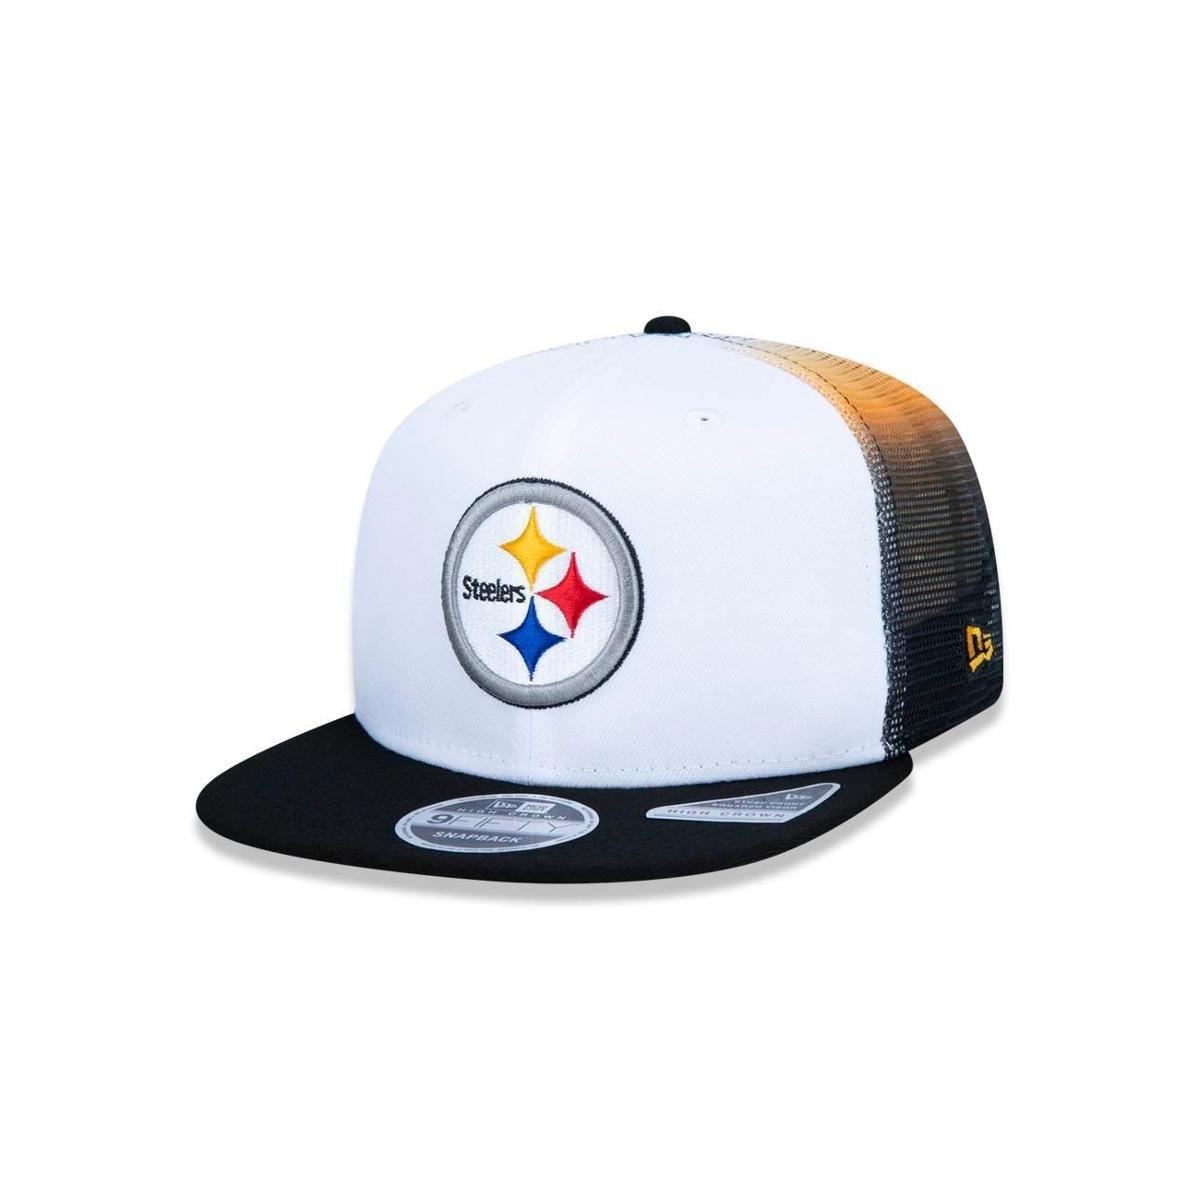 Boné 950 Pittsburgh Steelers NFL Aba Reta New Era - Compre Agora ... 873ae9dd766